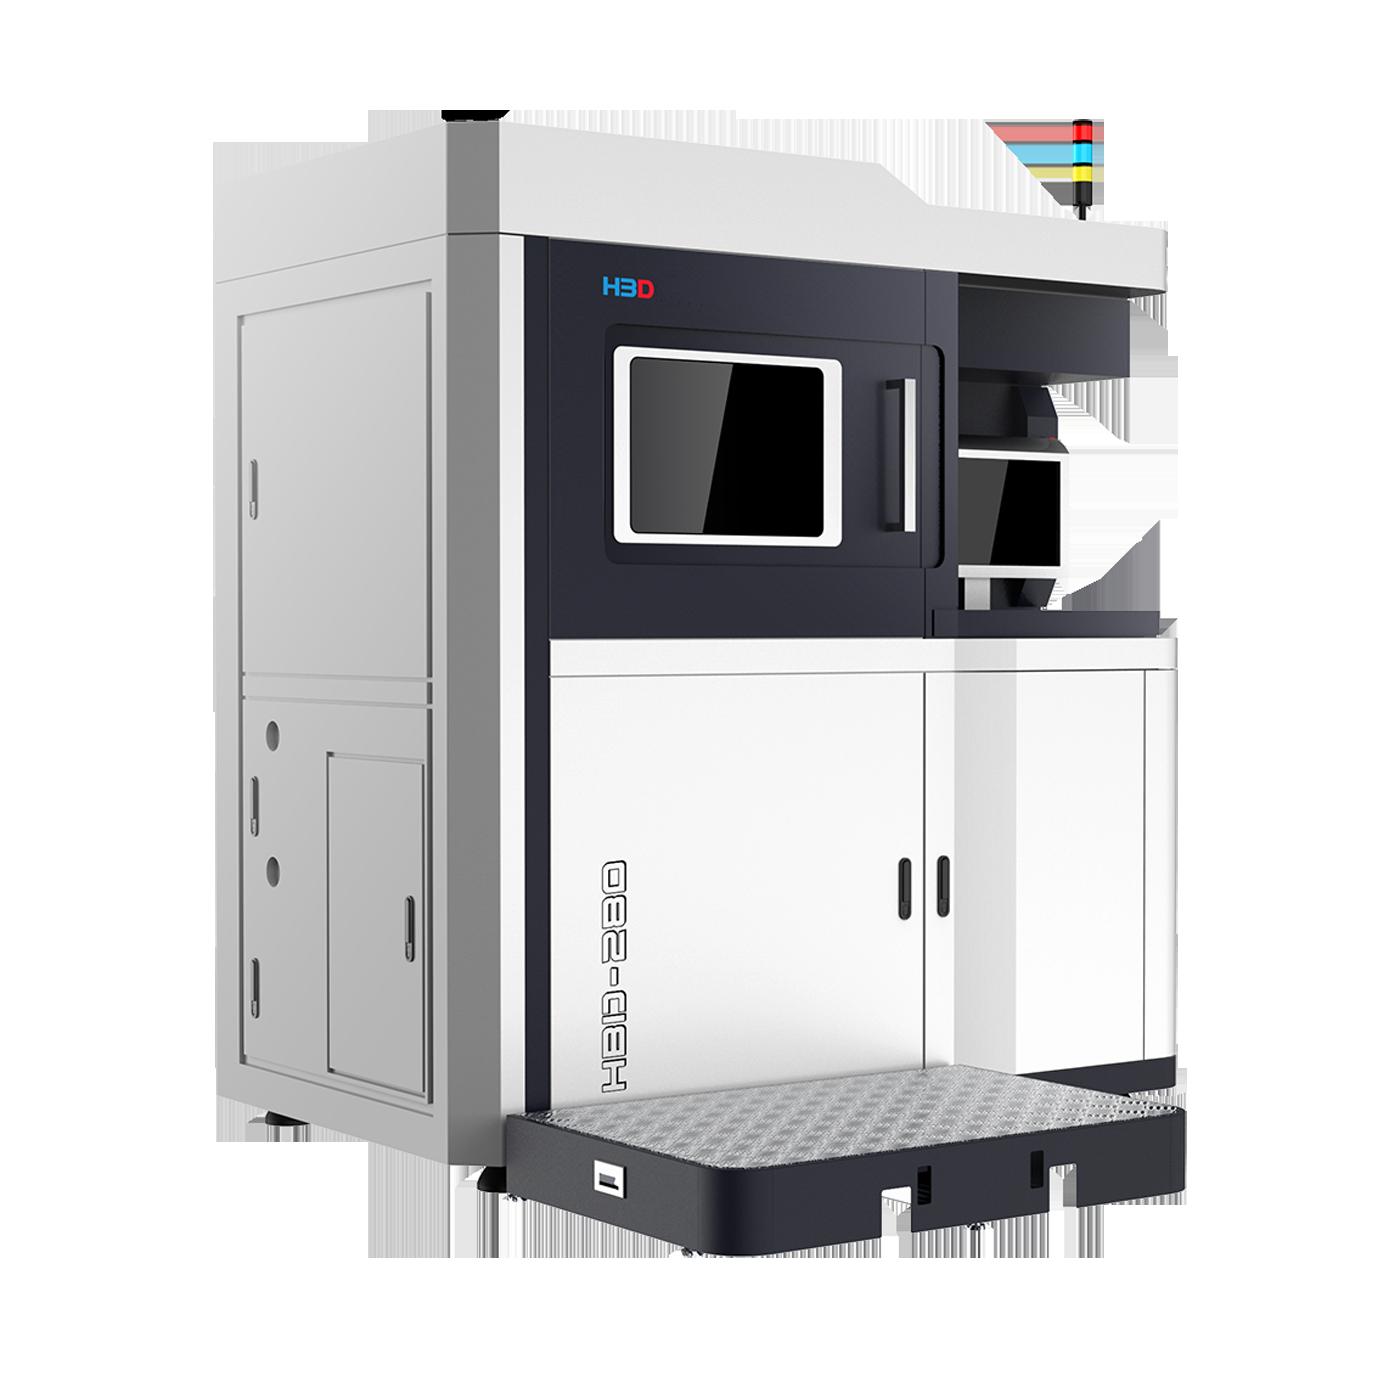 HBD-280 SLM 3D PRINTER